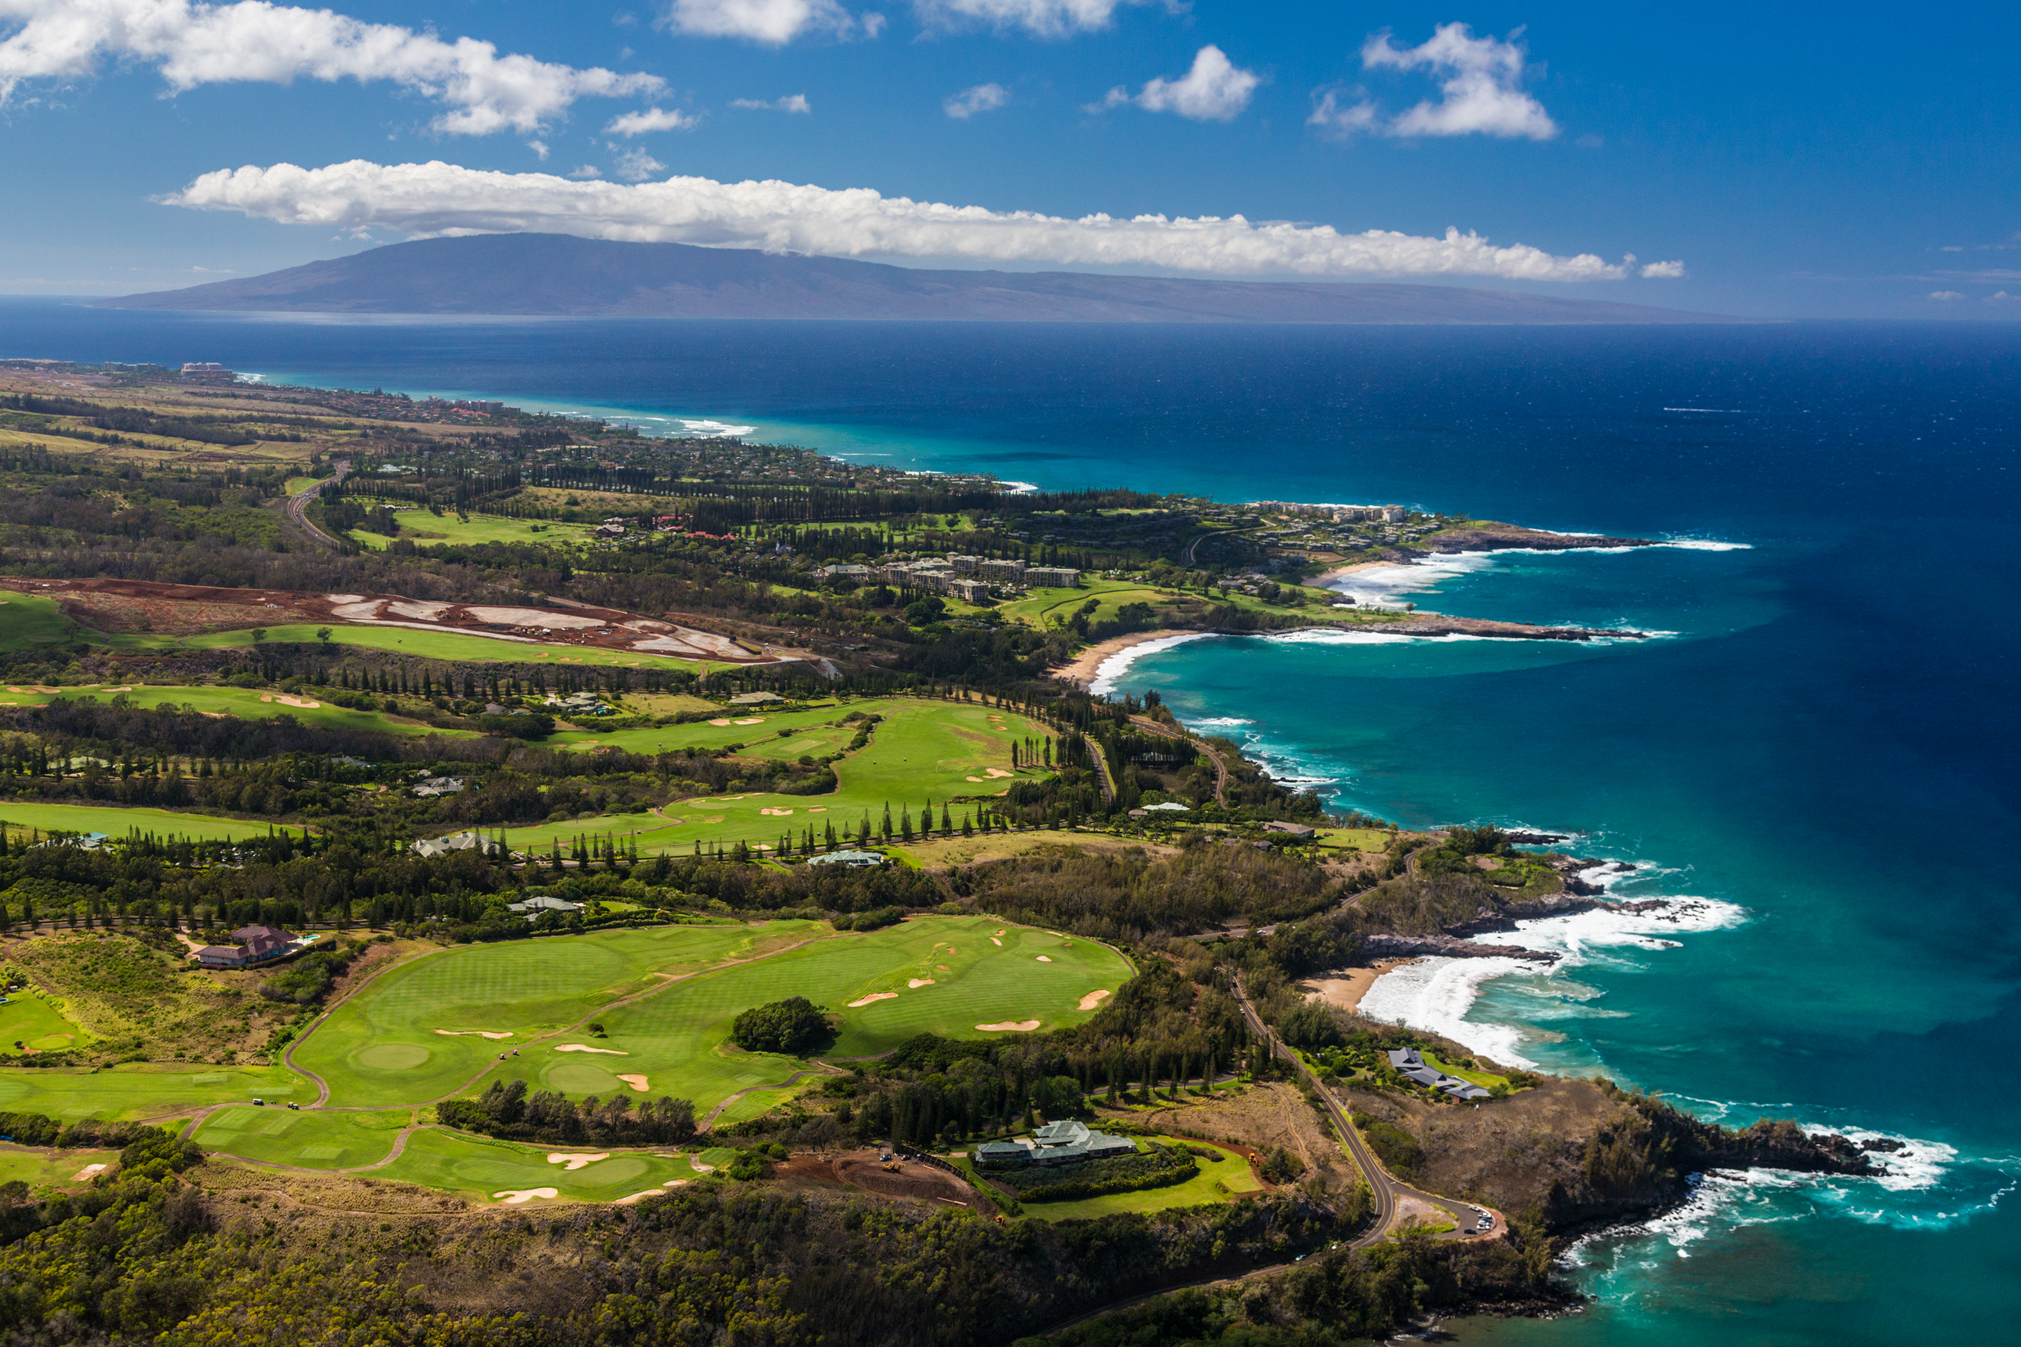 Photo Credit: Hawaii Tourism Authority (HTA)/Tor Johnson